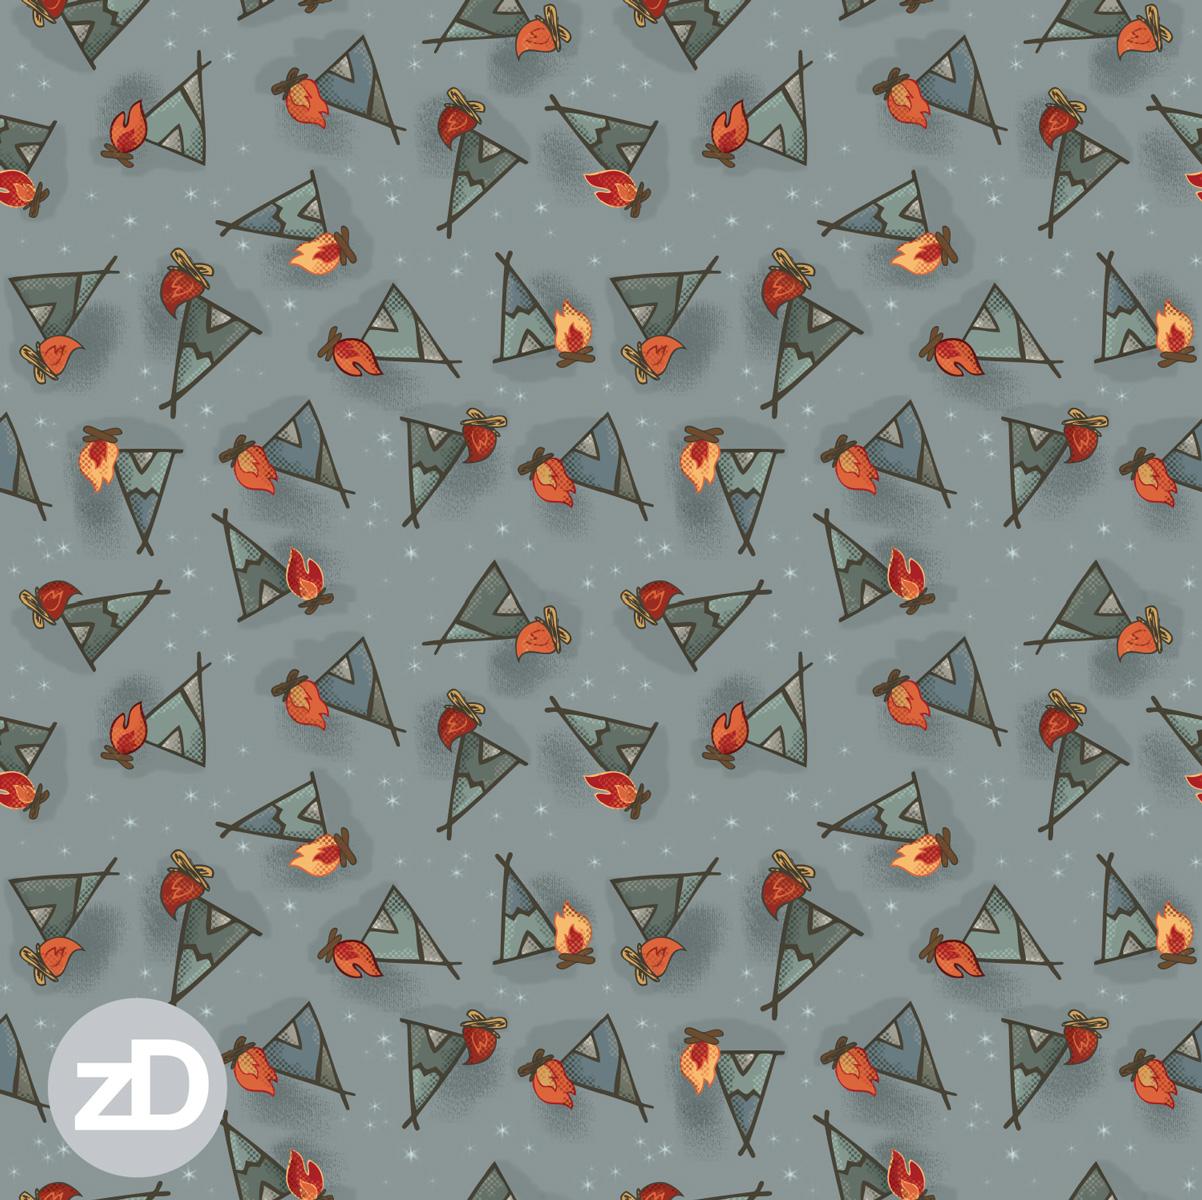 Zirkus Design | Cody Arizona Wild West Pattern Collection : TeePees Tipis + Campfire Fire Under the Stars